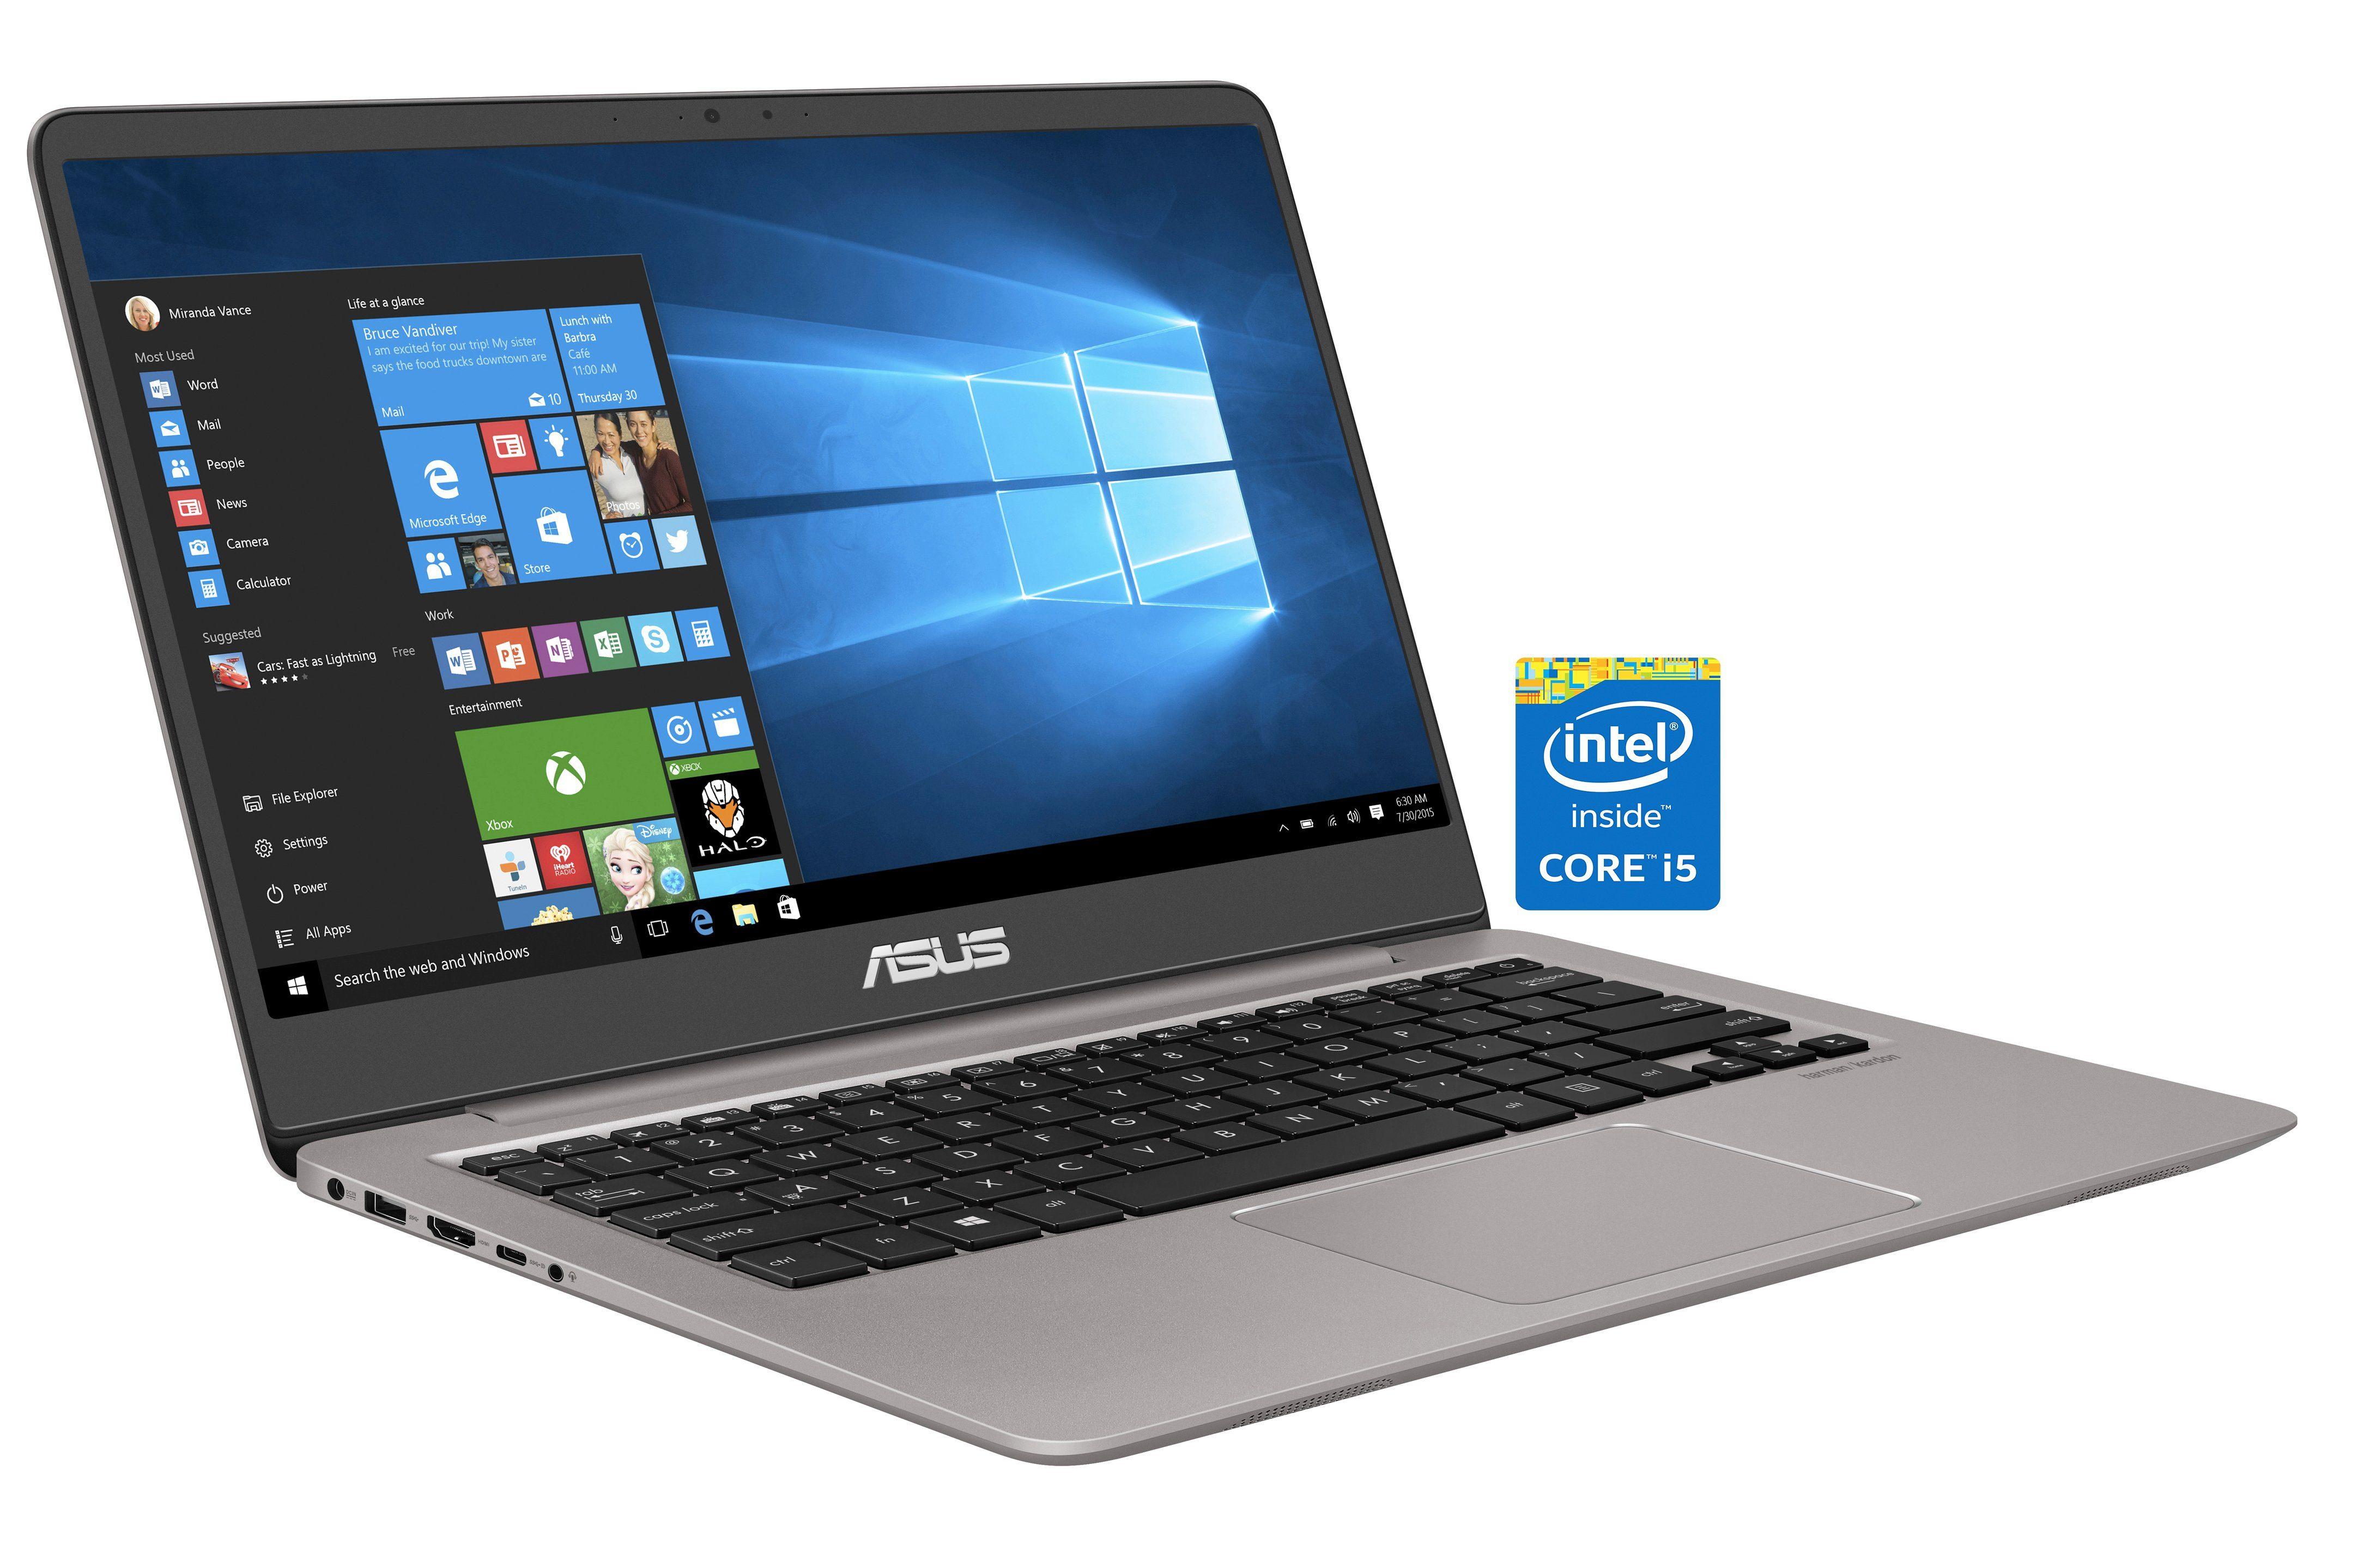 Asus Notebook/Ultrabook »UX3410UA-GV628T I5-7200U 2.5G«